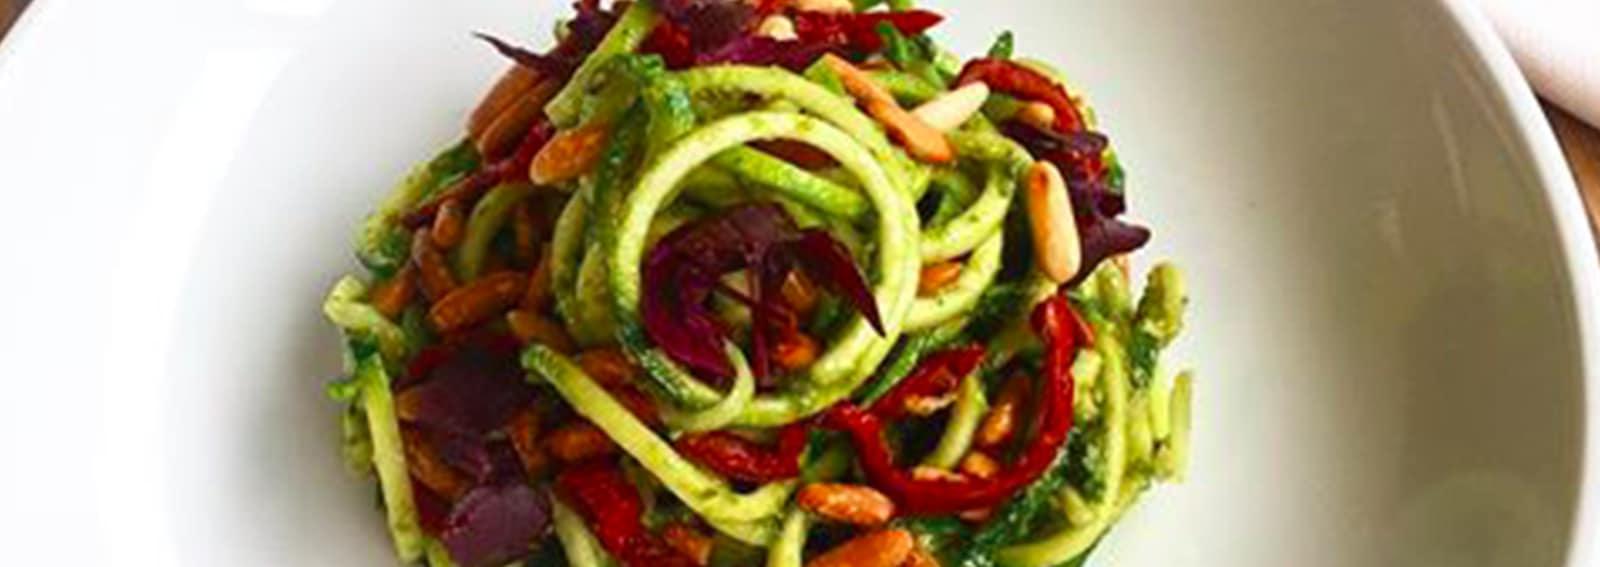 cover prova dieta vegana citta italiane desktop